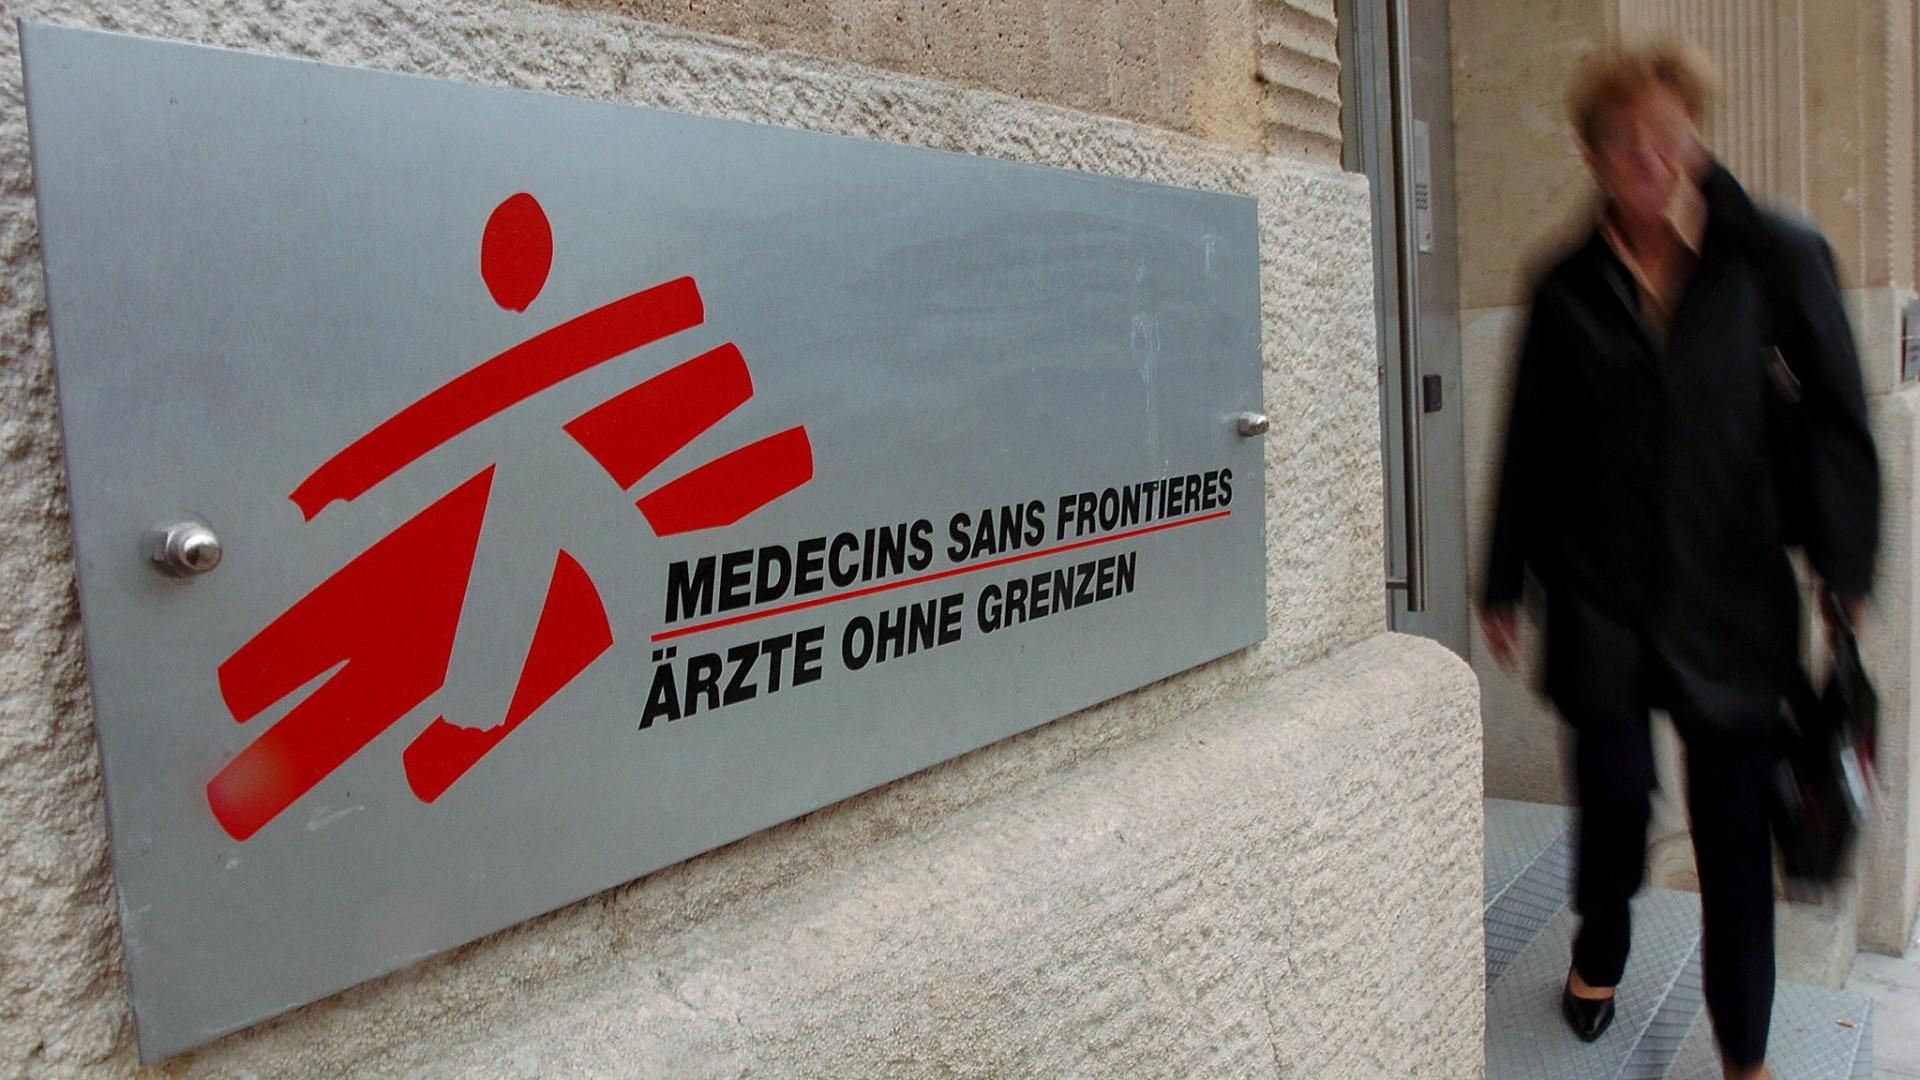 MSF identificou 24 casos de assédio e abuso sexual no seio da Oxfam